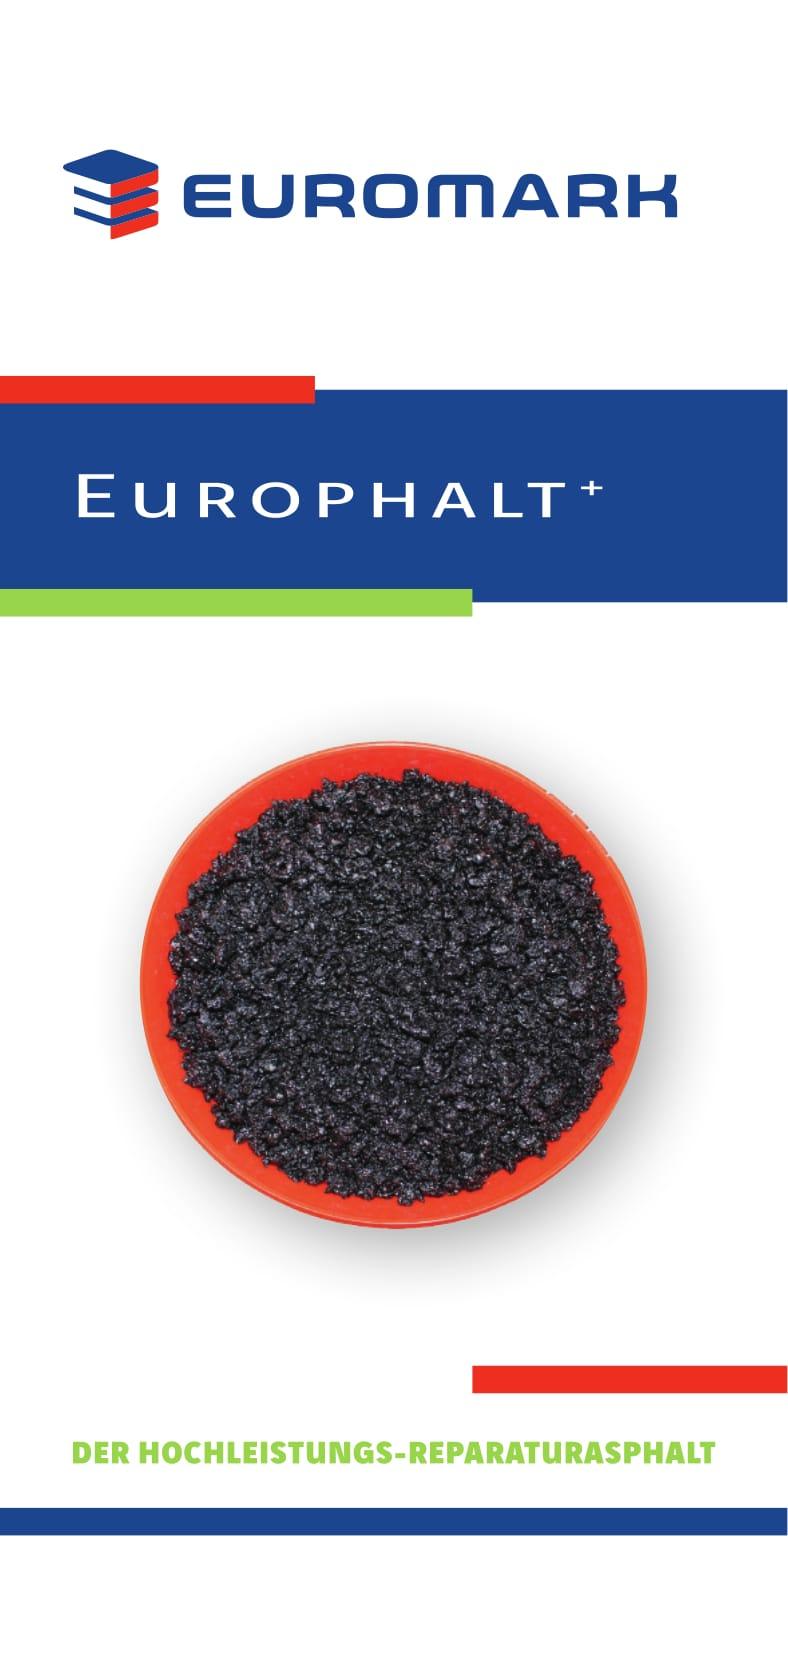 euromark_europhalt_deu_web-1